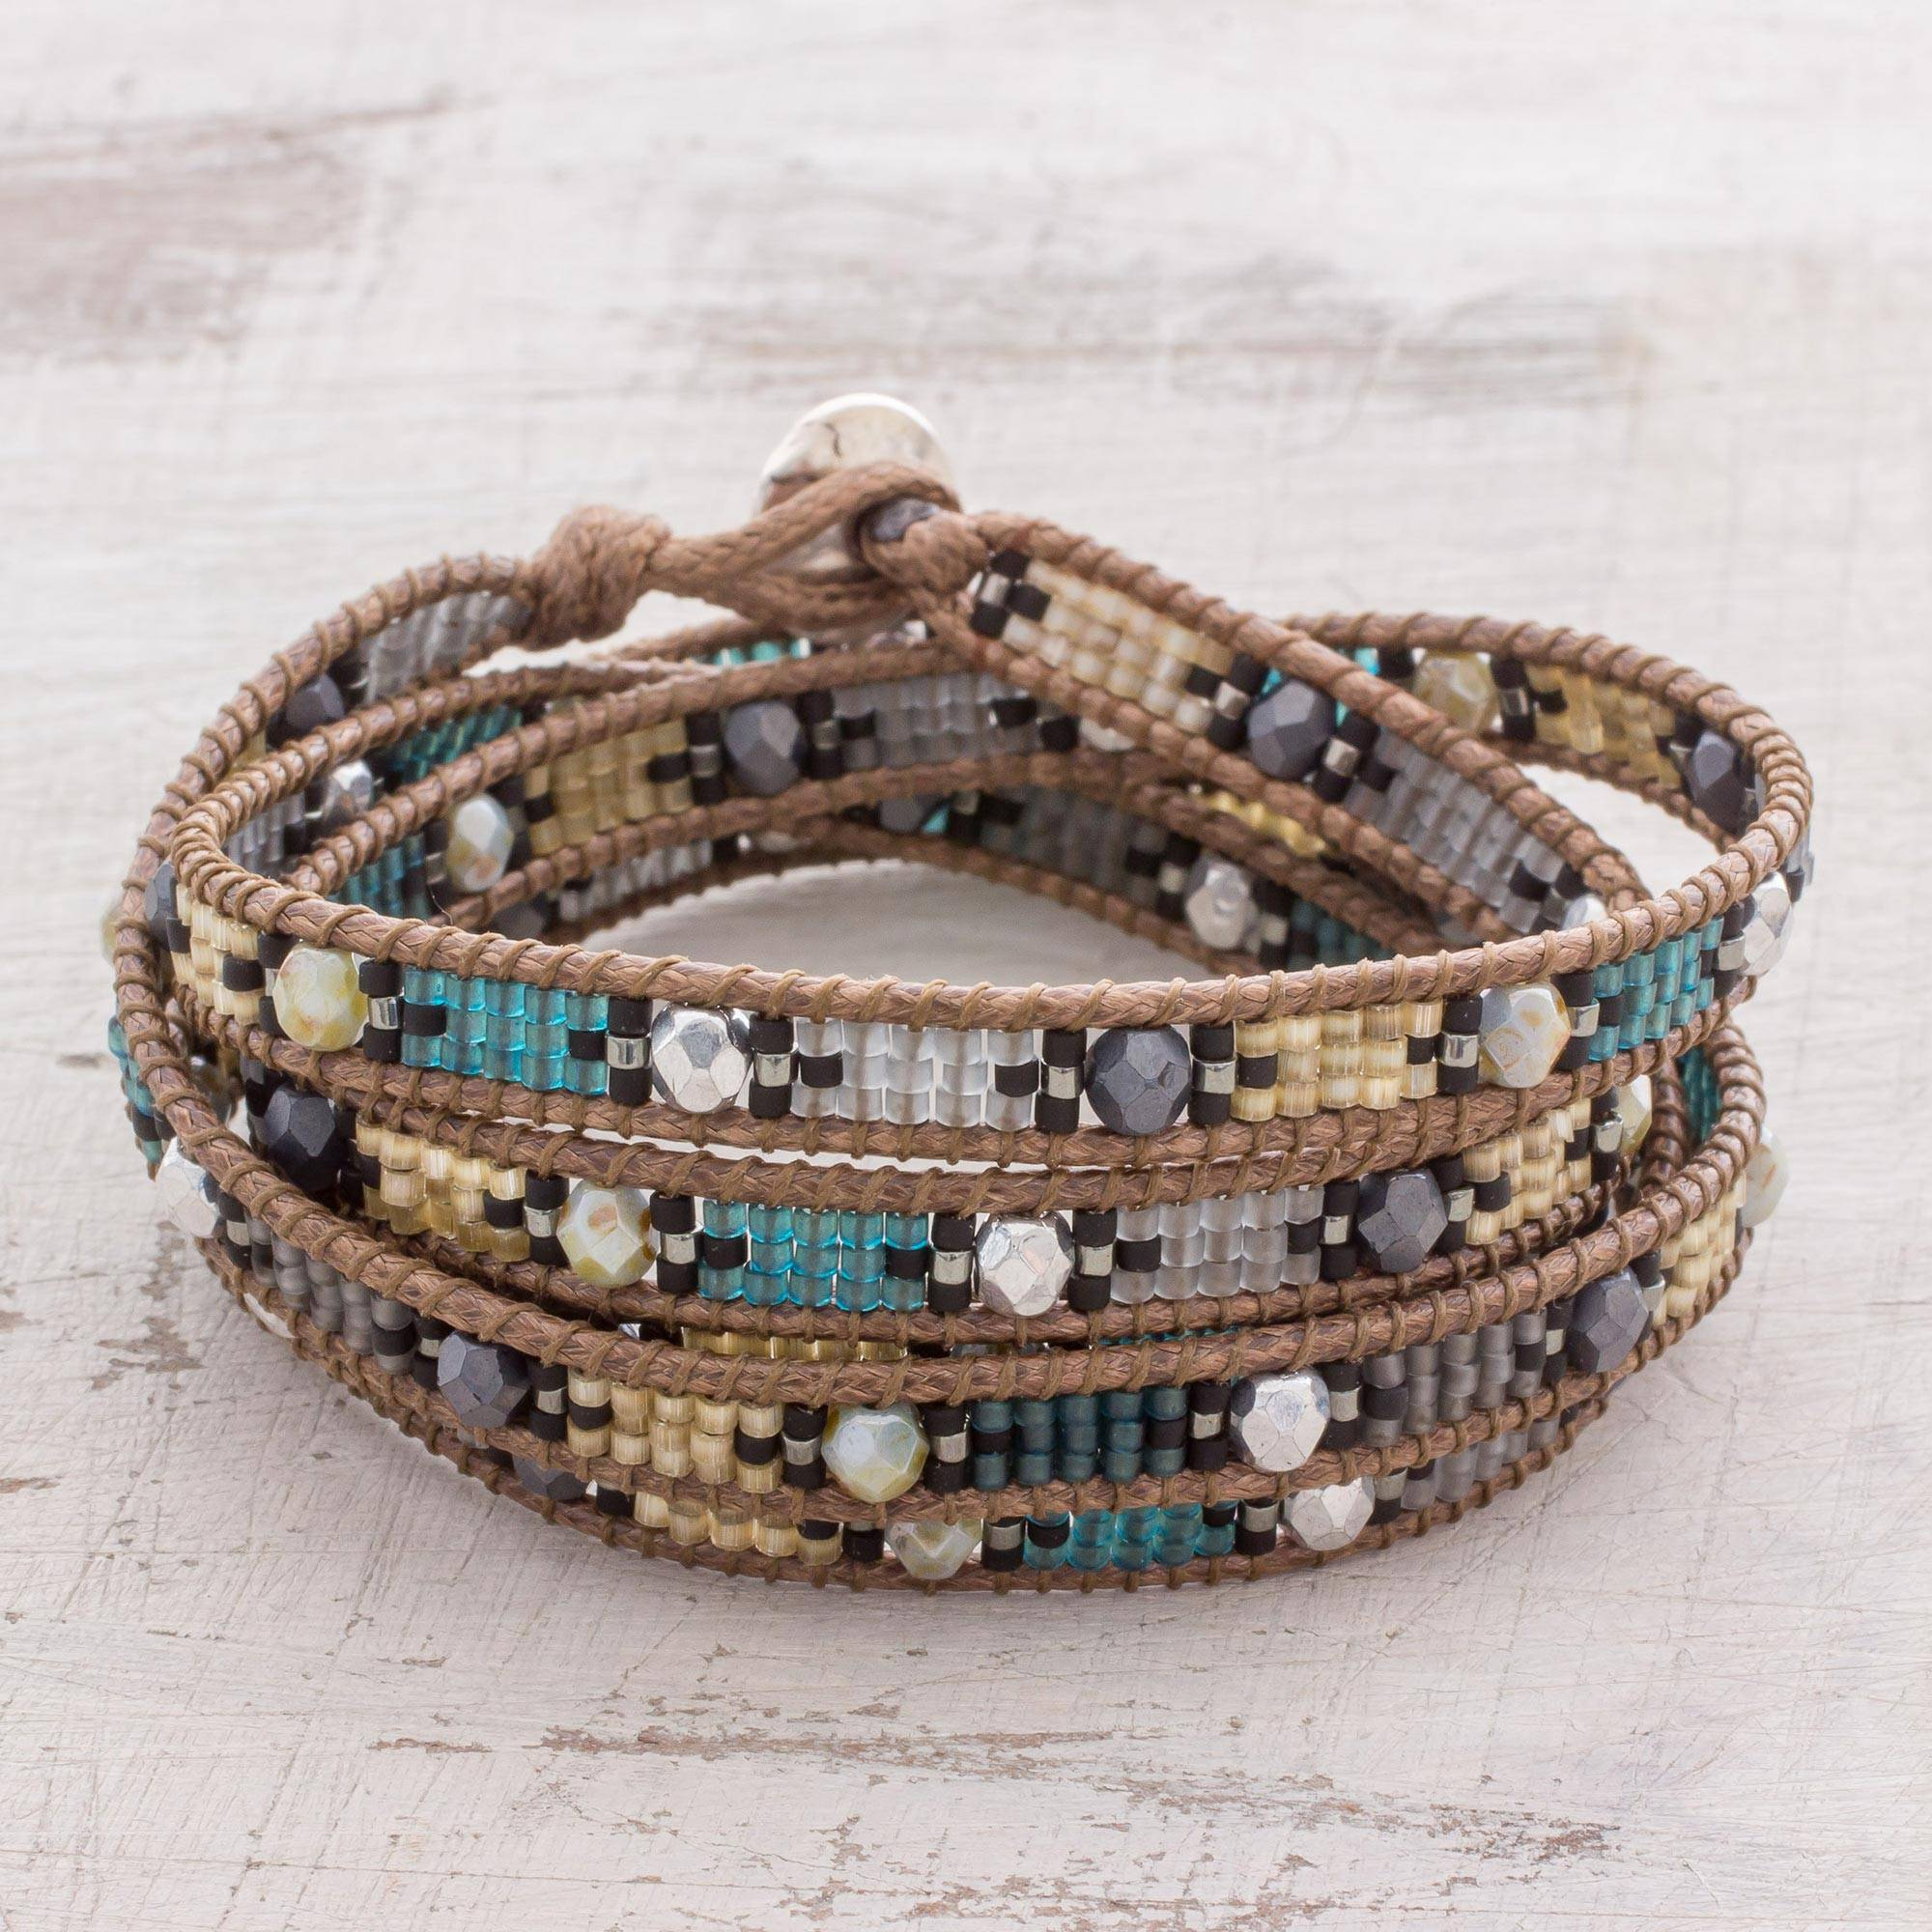 Shining Gl Beaded Wrap Bracelet From Guatemala Fleeting Star